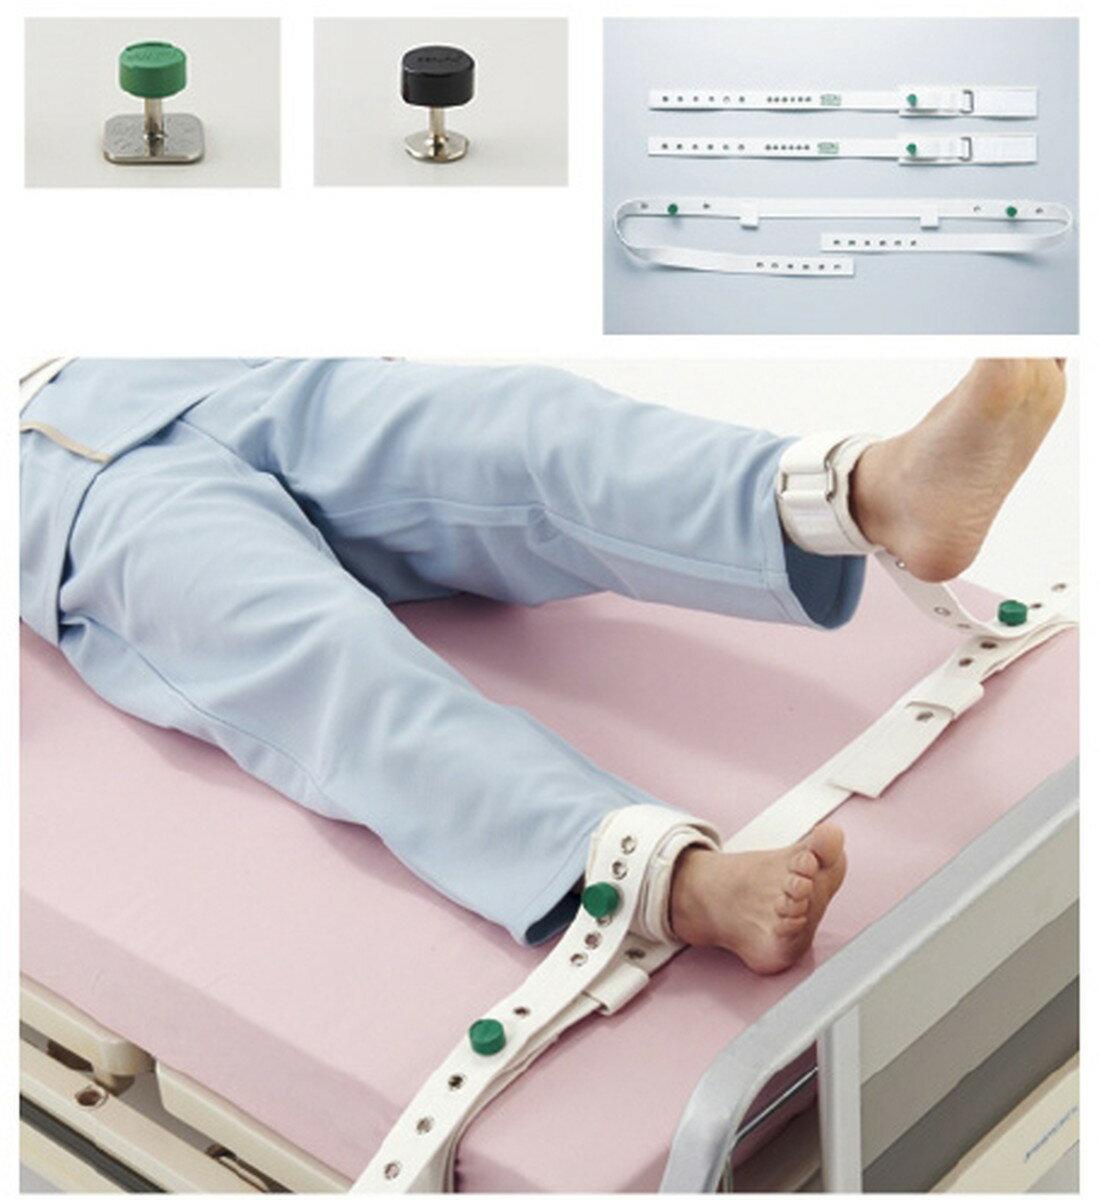 身体測定器・医療計測器, その他 16- T L() my23-7605-02-- 1-MYJAN 4535847000648